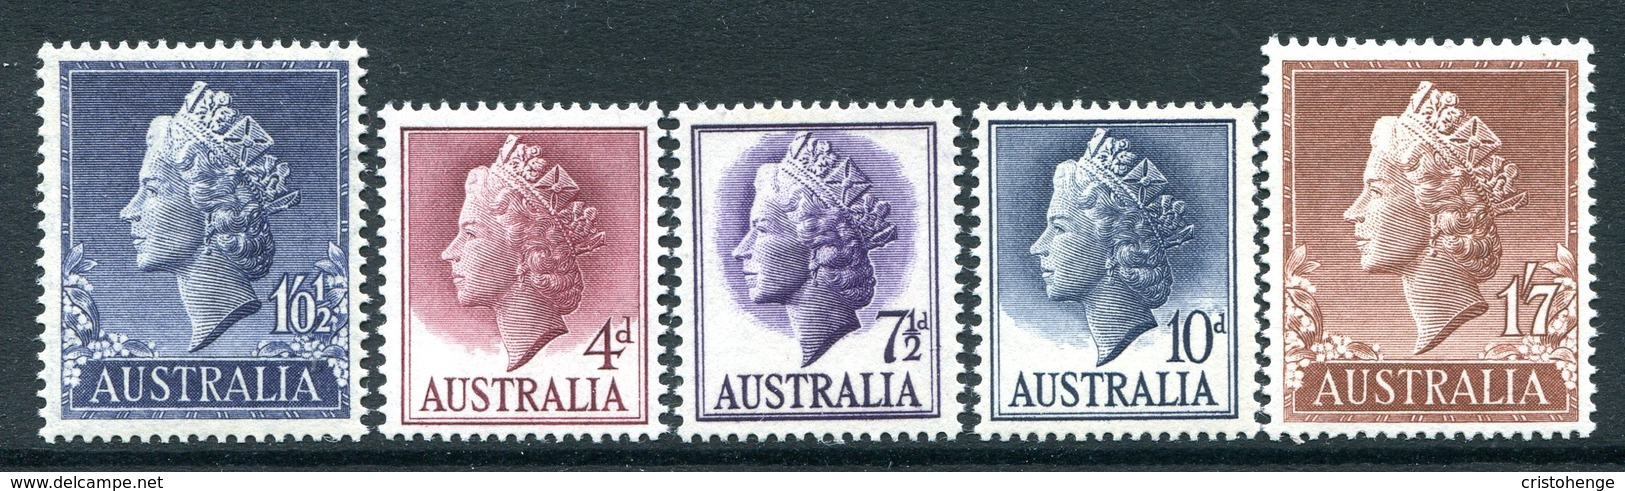 Australia 1955-57 QEII Definitives Set MNH (SG 282-282d) - 1952-65 Elizabeth II : Pre-Decimals